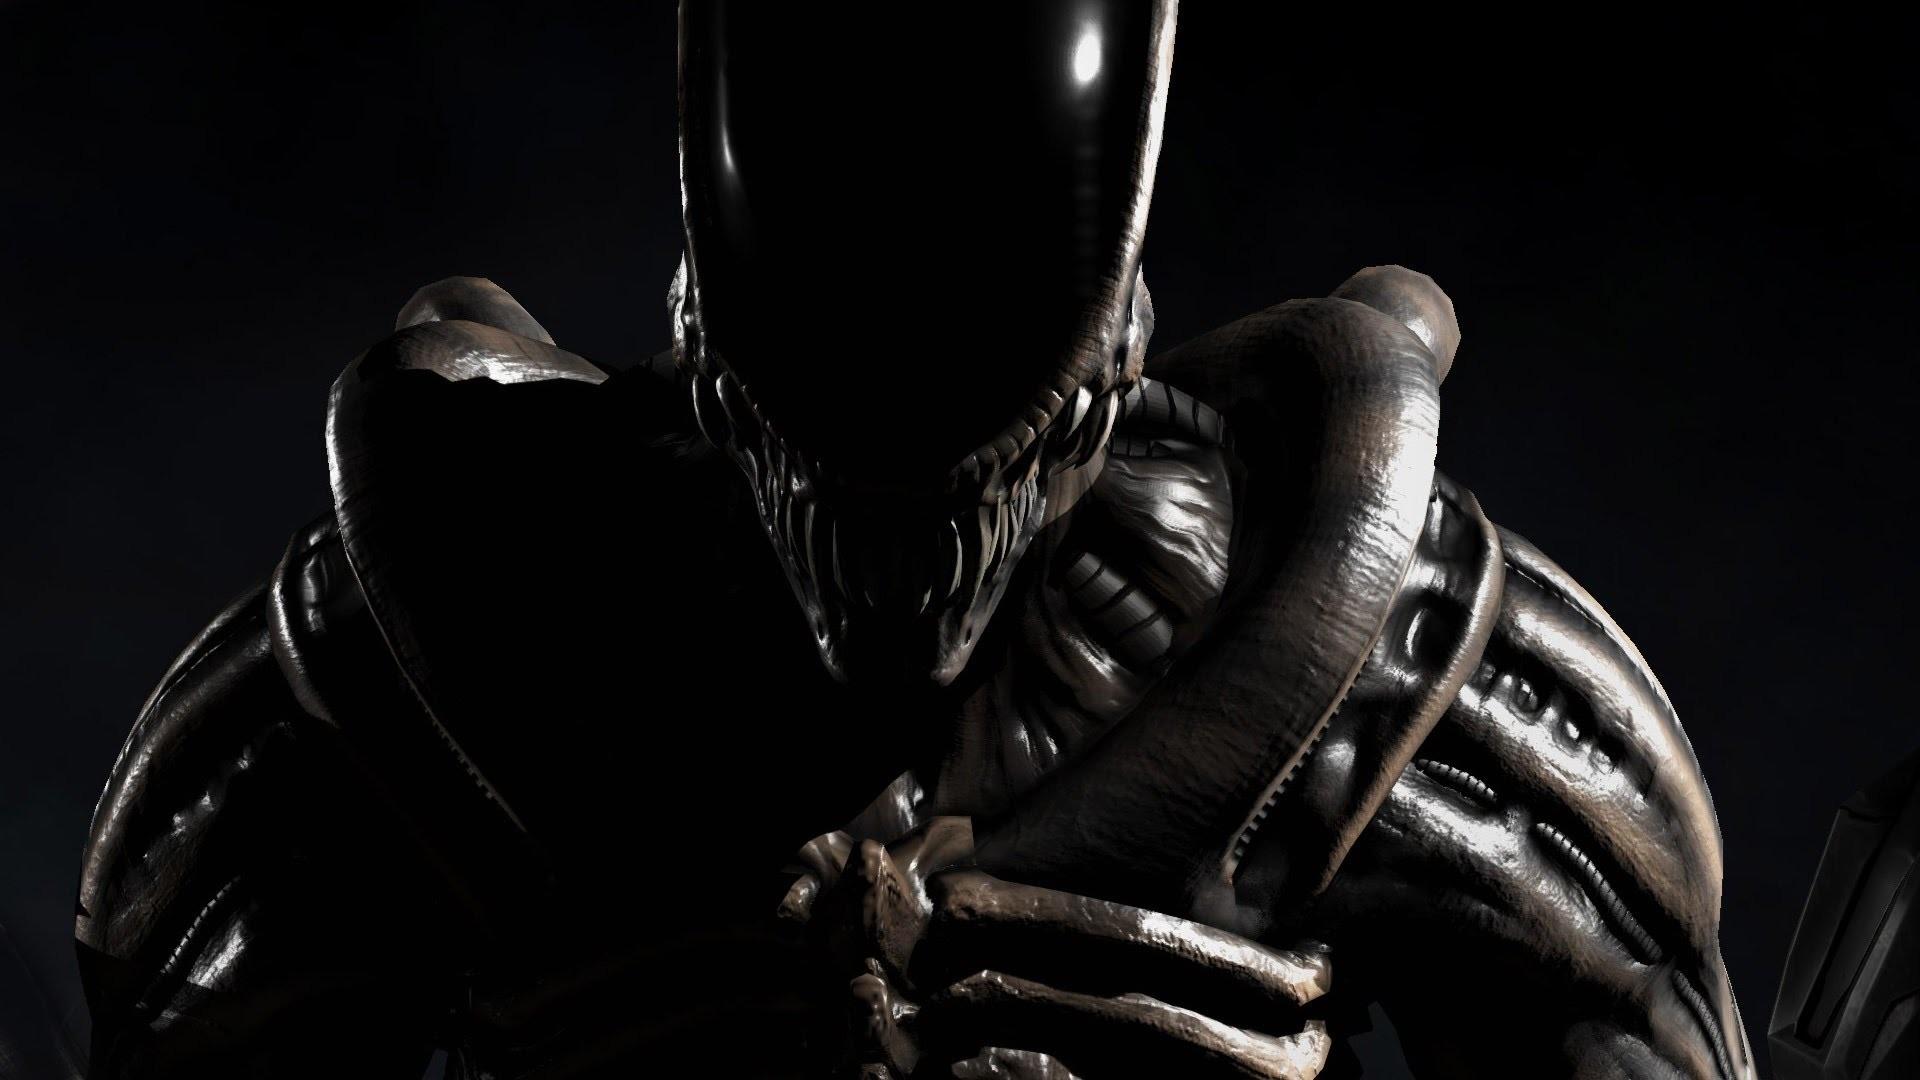 Res: 1920x1080, Alien & Leatherface Go Berserk in Mortal Kombat X Trailer - MovieWeb